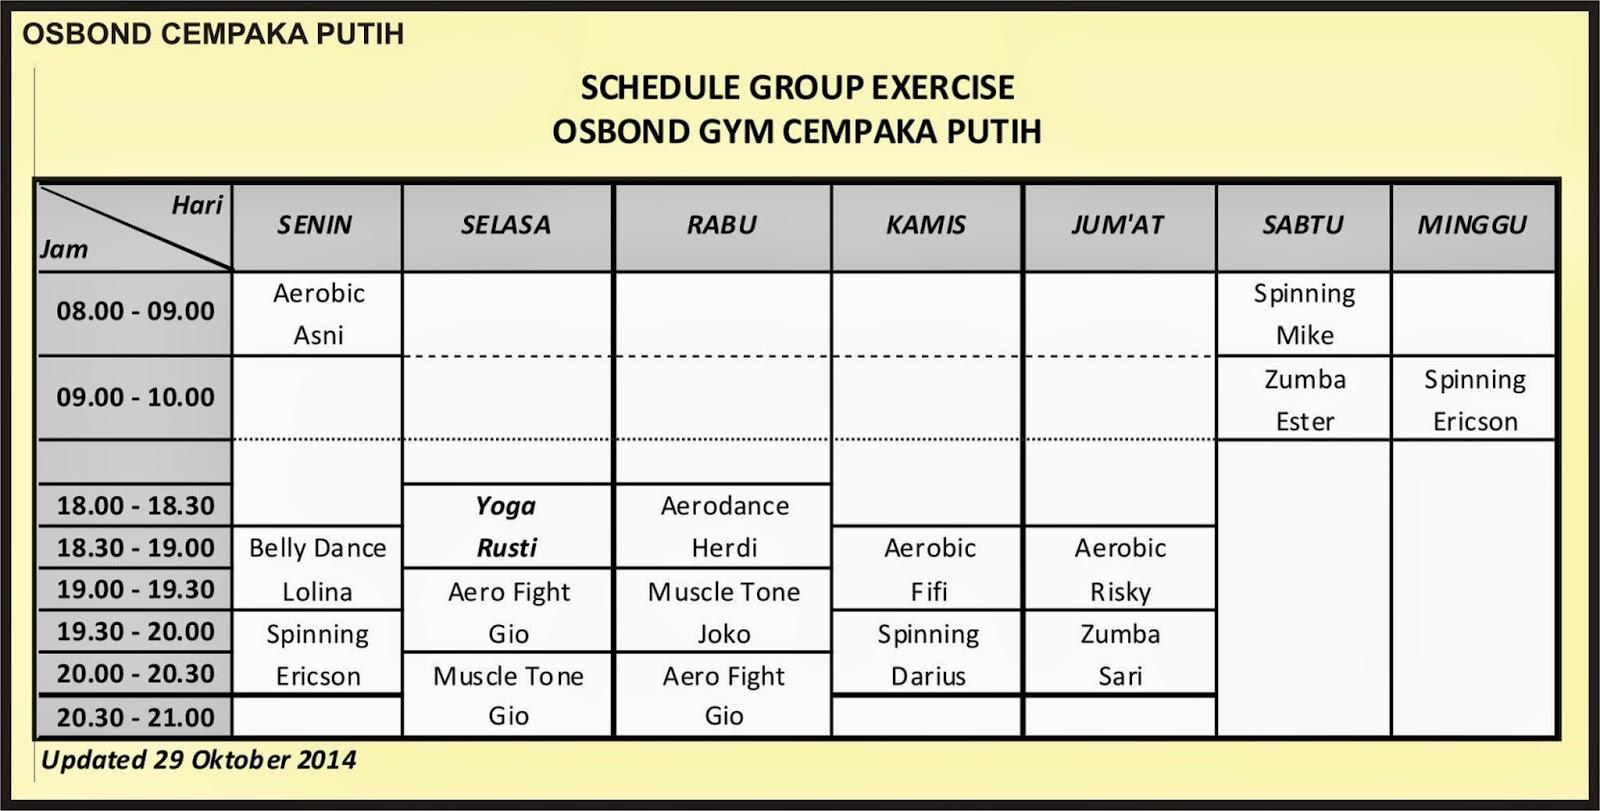 MEGA GYM INDONESIA: Schedule Exercise Group Mega GYM OSBOND